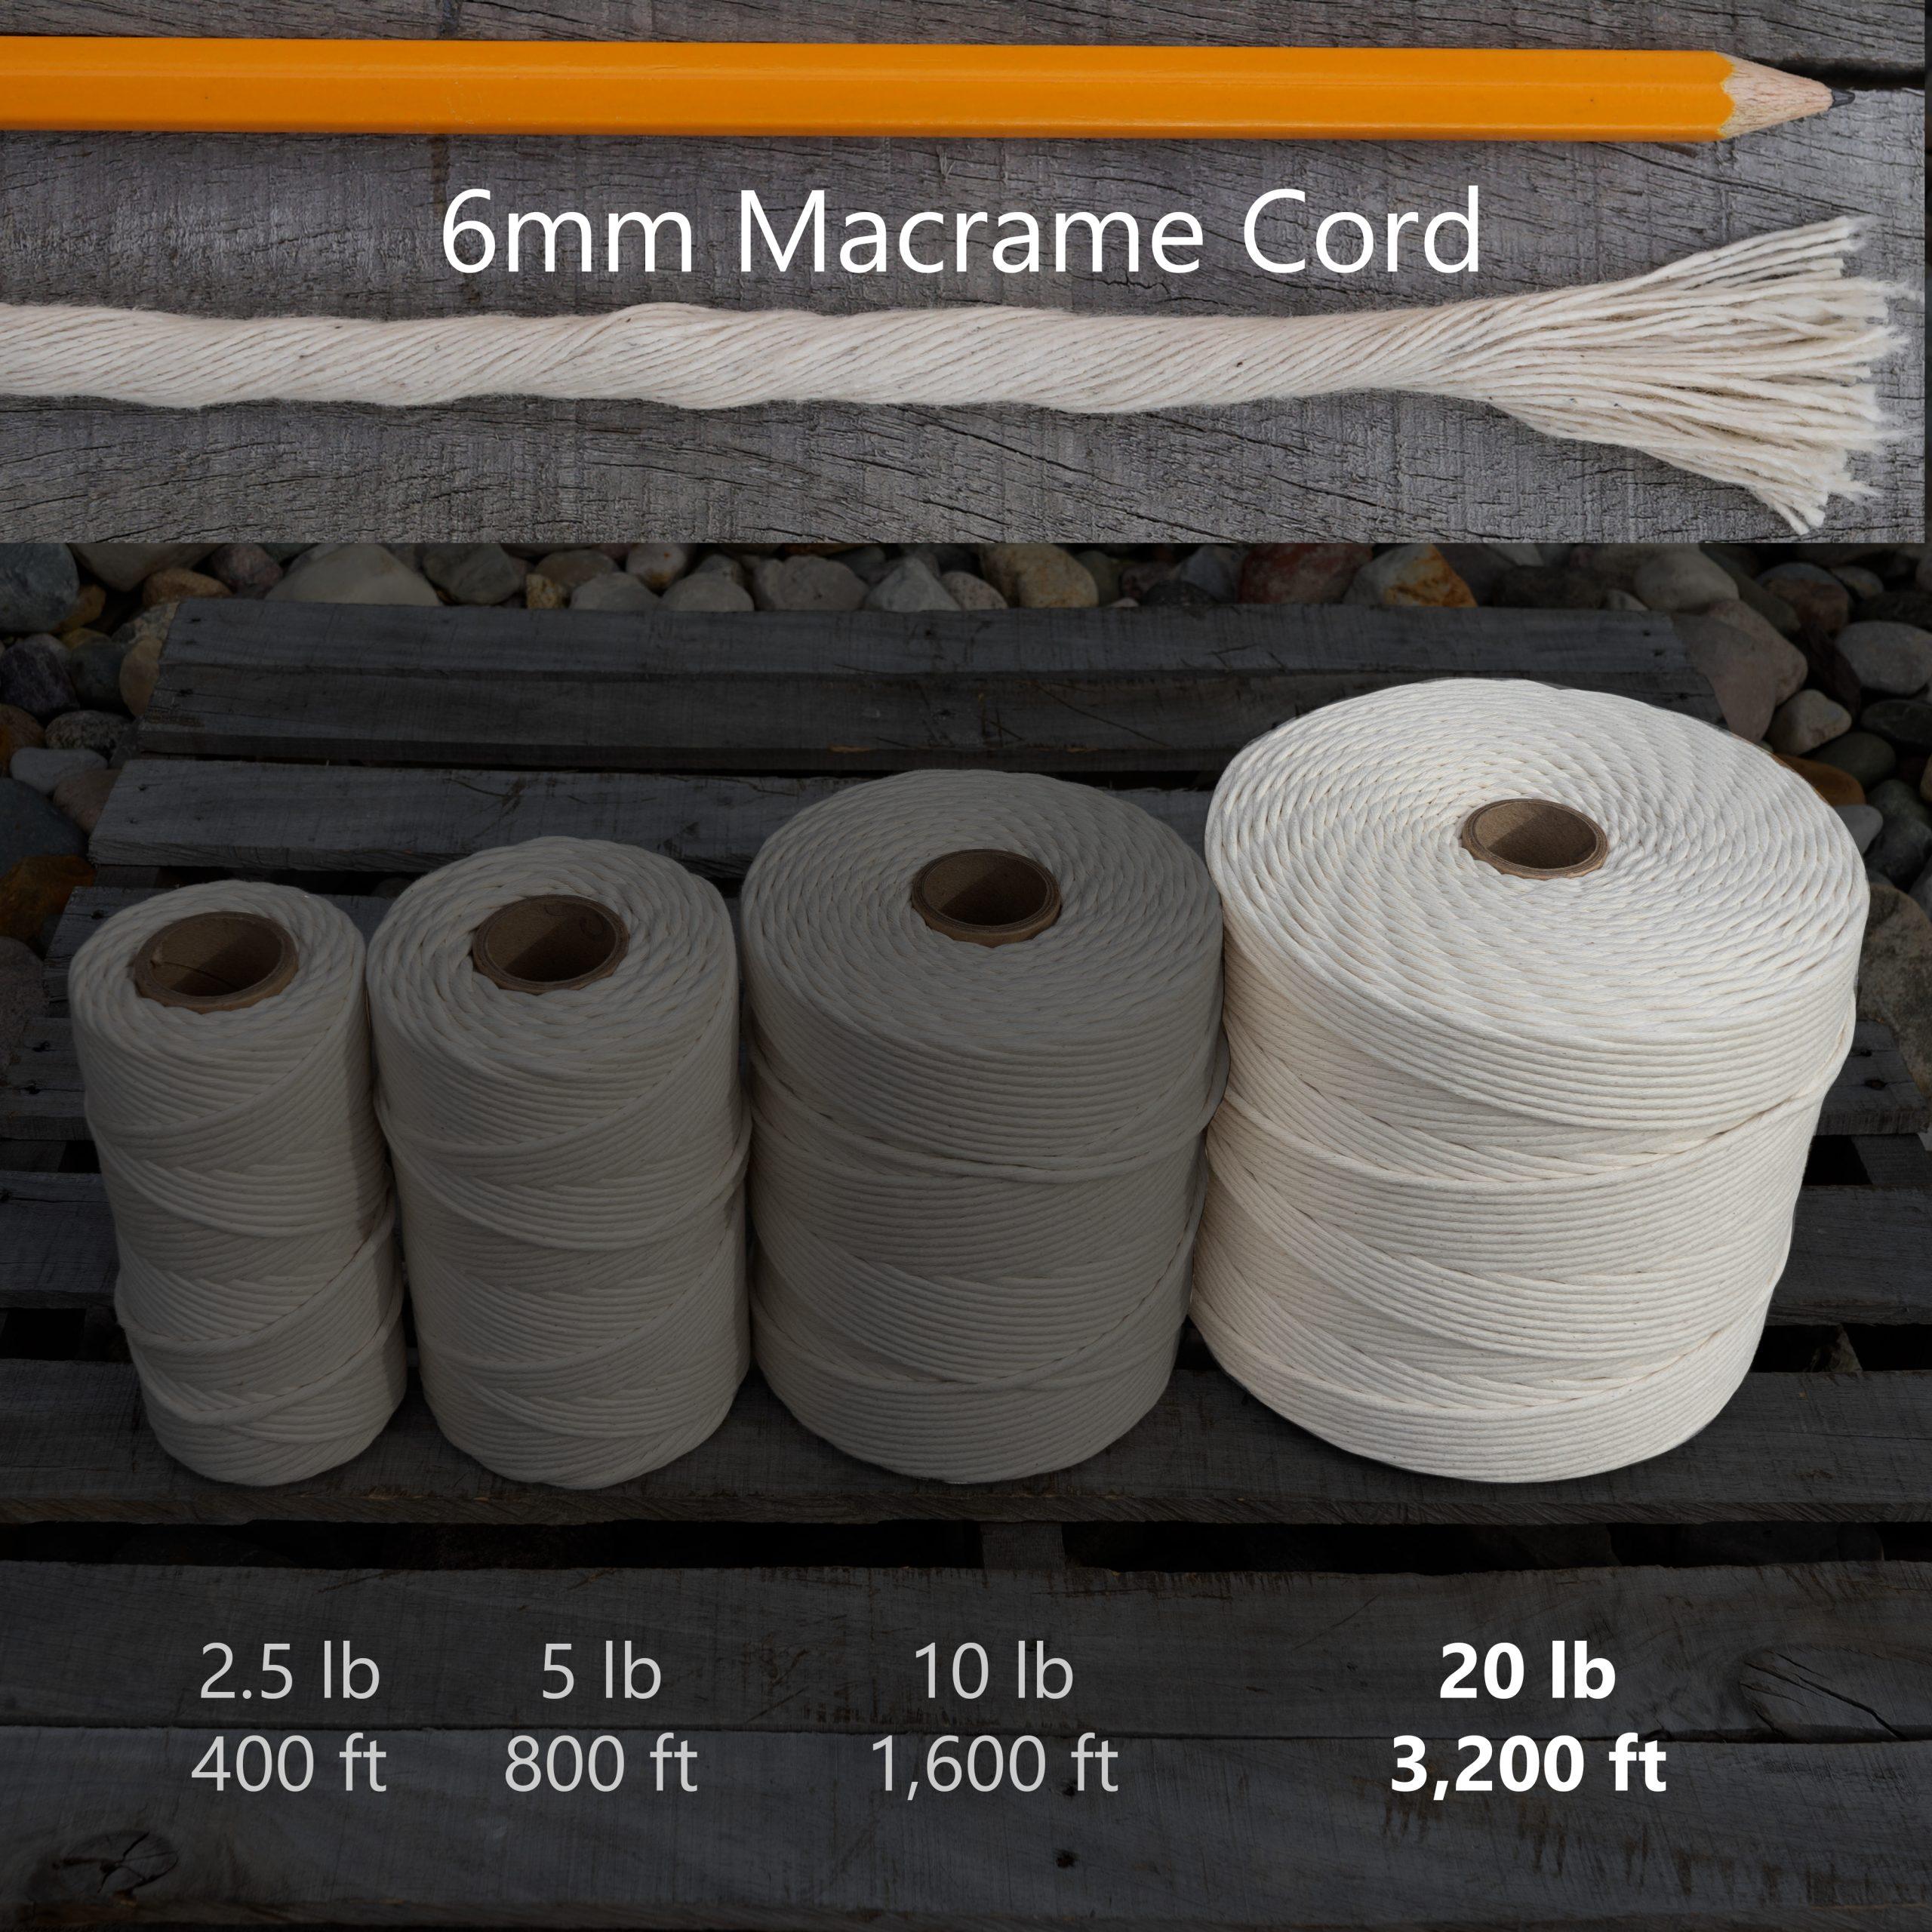 6 mm x 20 lb macrame tube